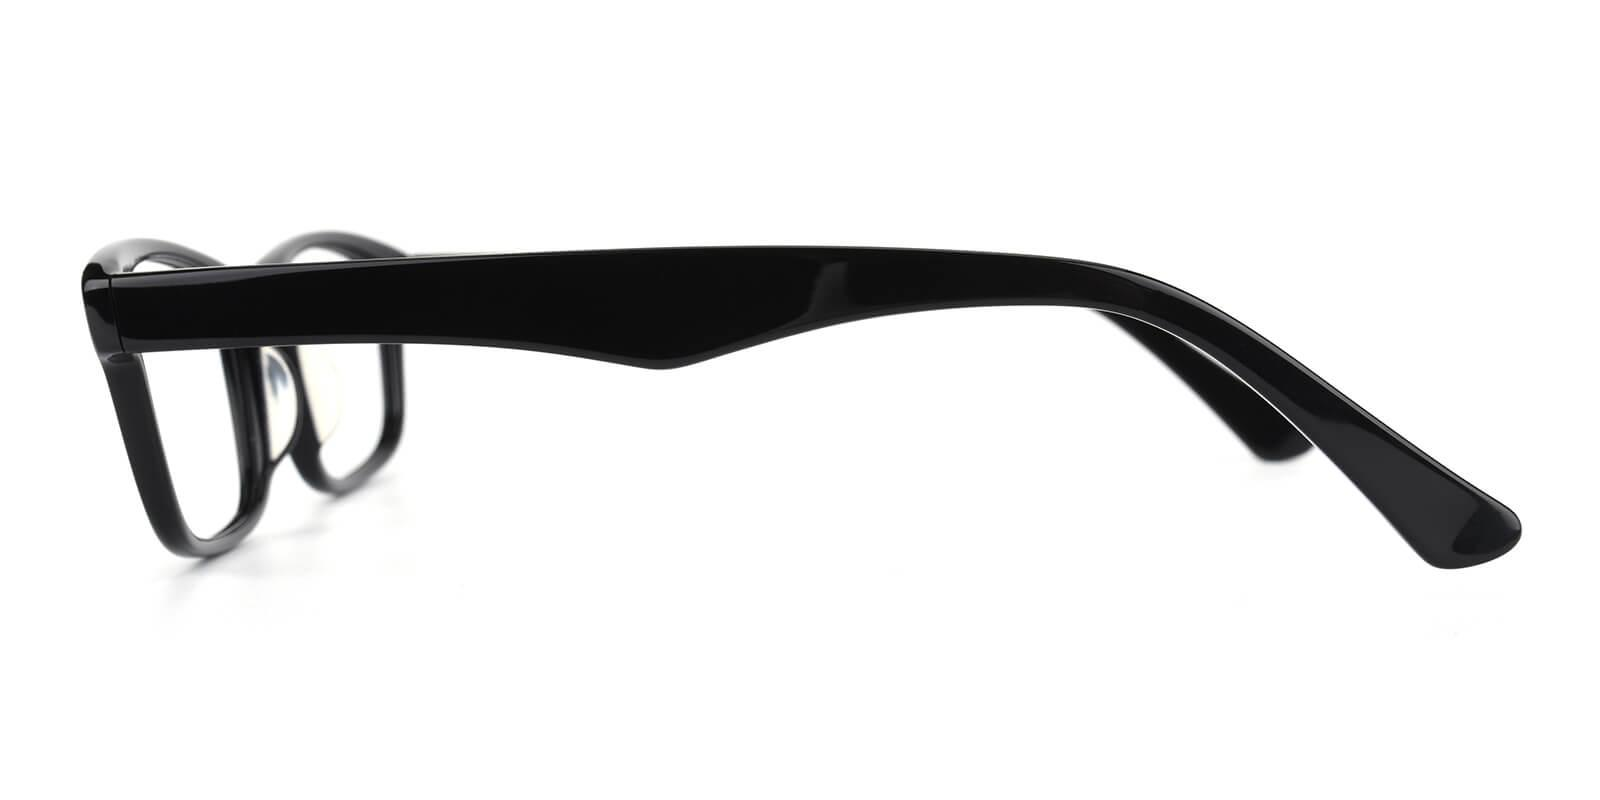 Katric-Black-Rectangle-Acetate-Eyeglasses-detail